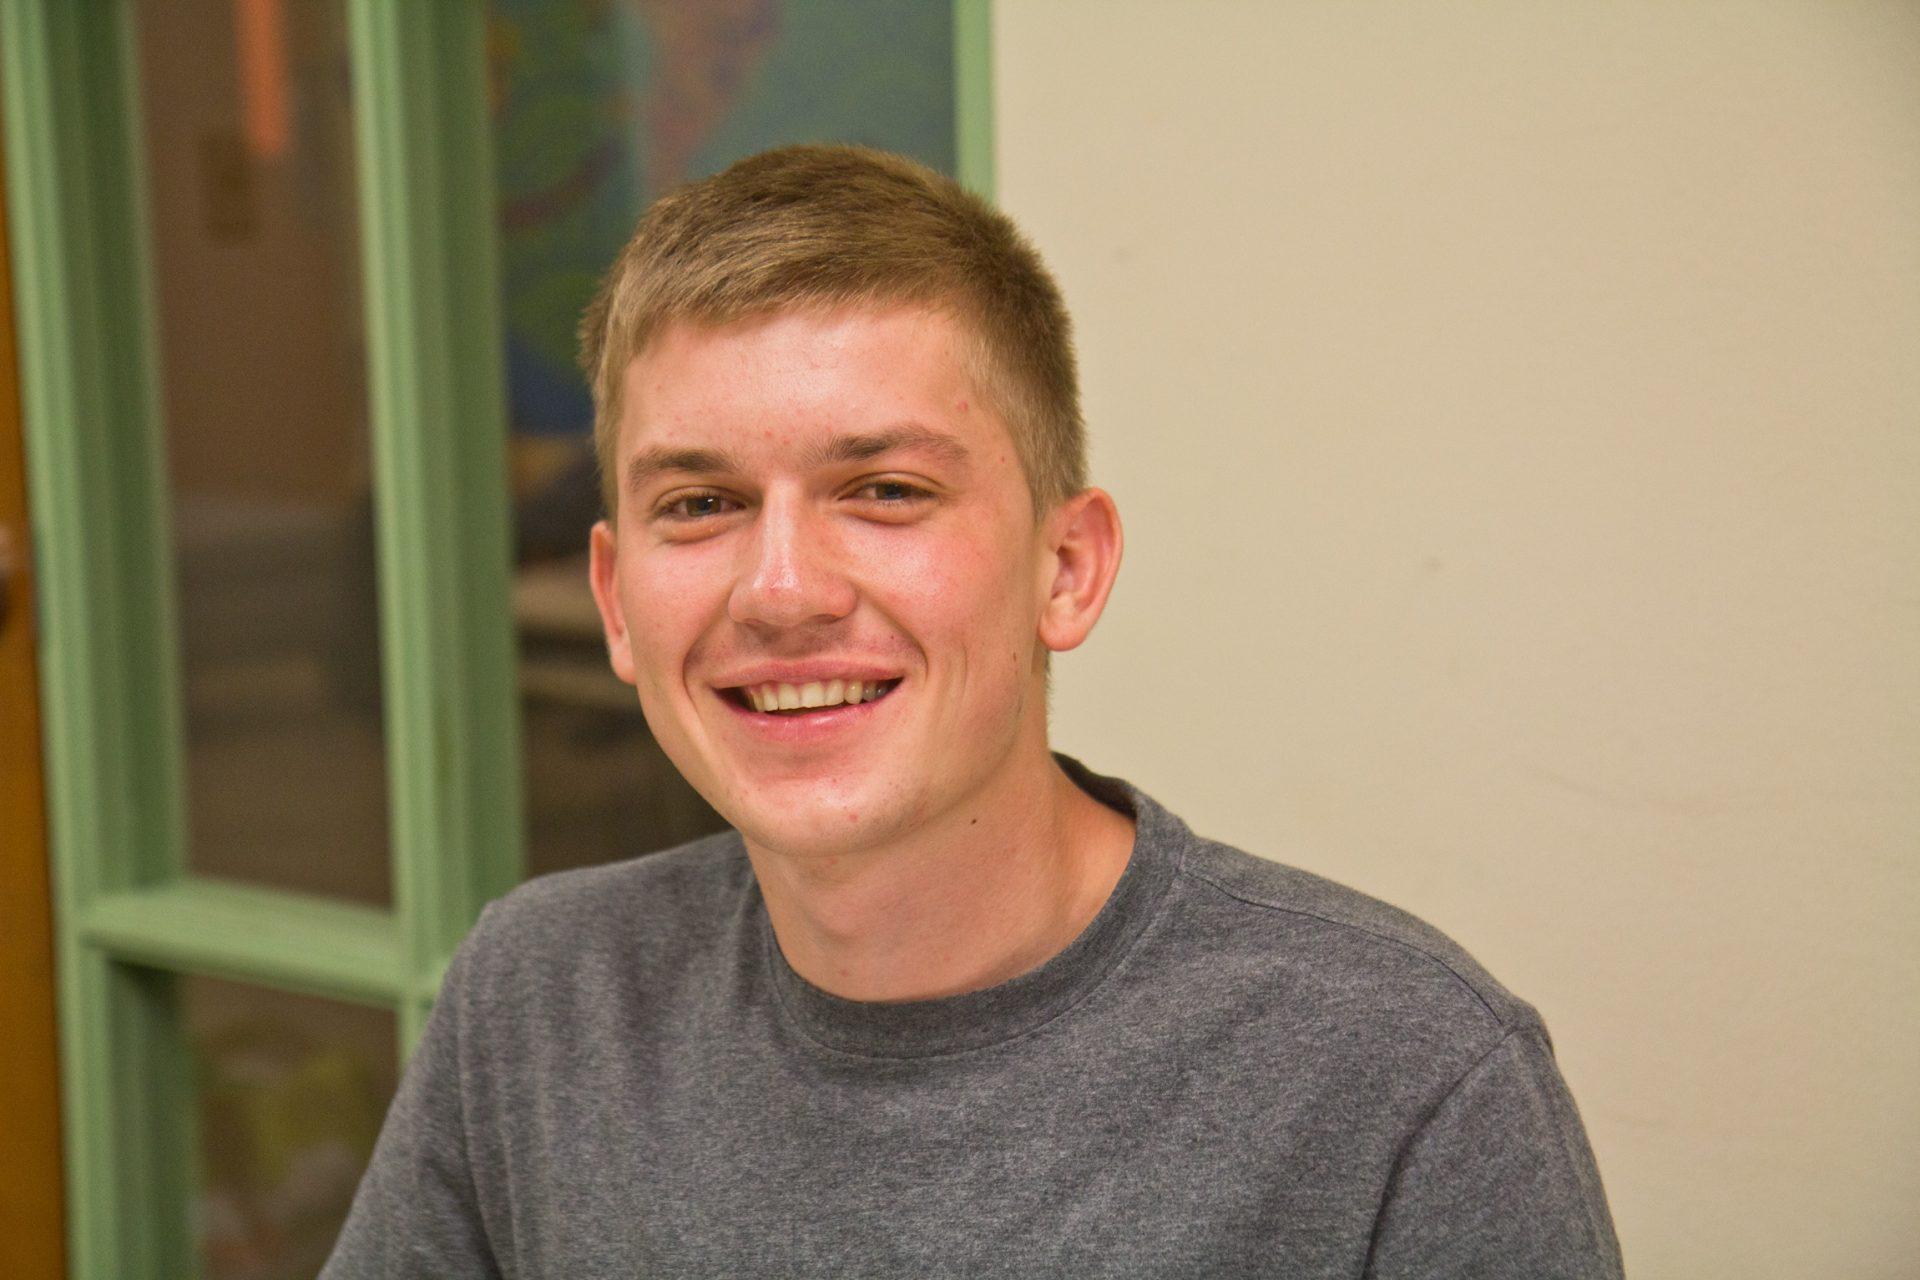 Krevskyi Bohdan, from Lutsk, Ukraine, is a refugee living in Bucks County.